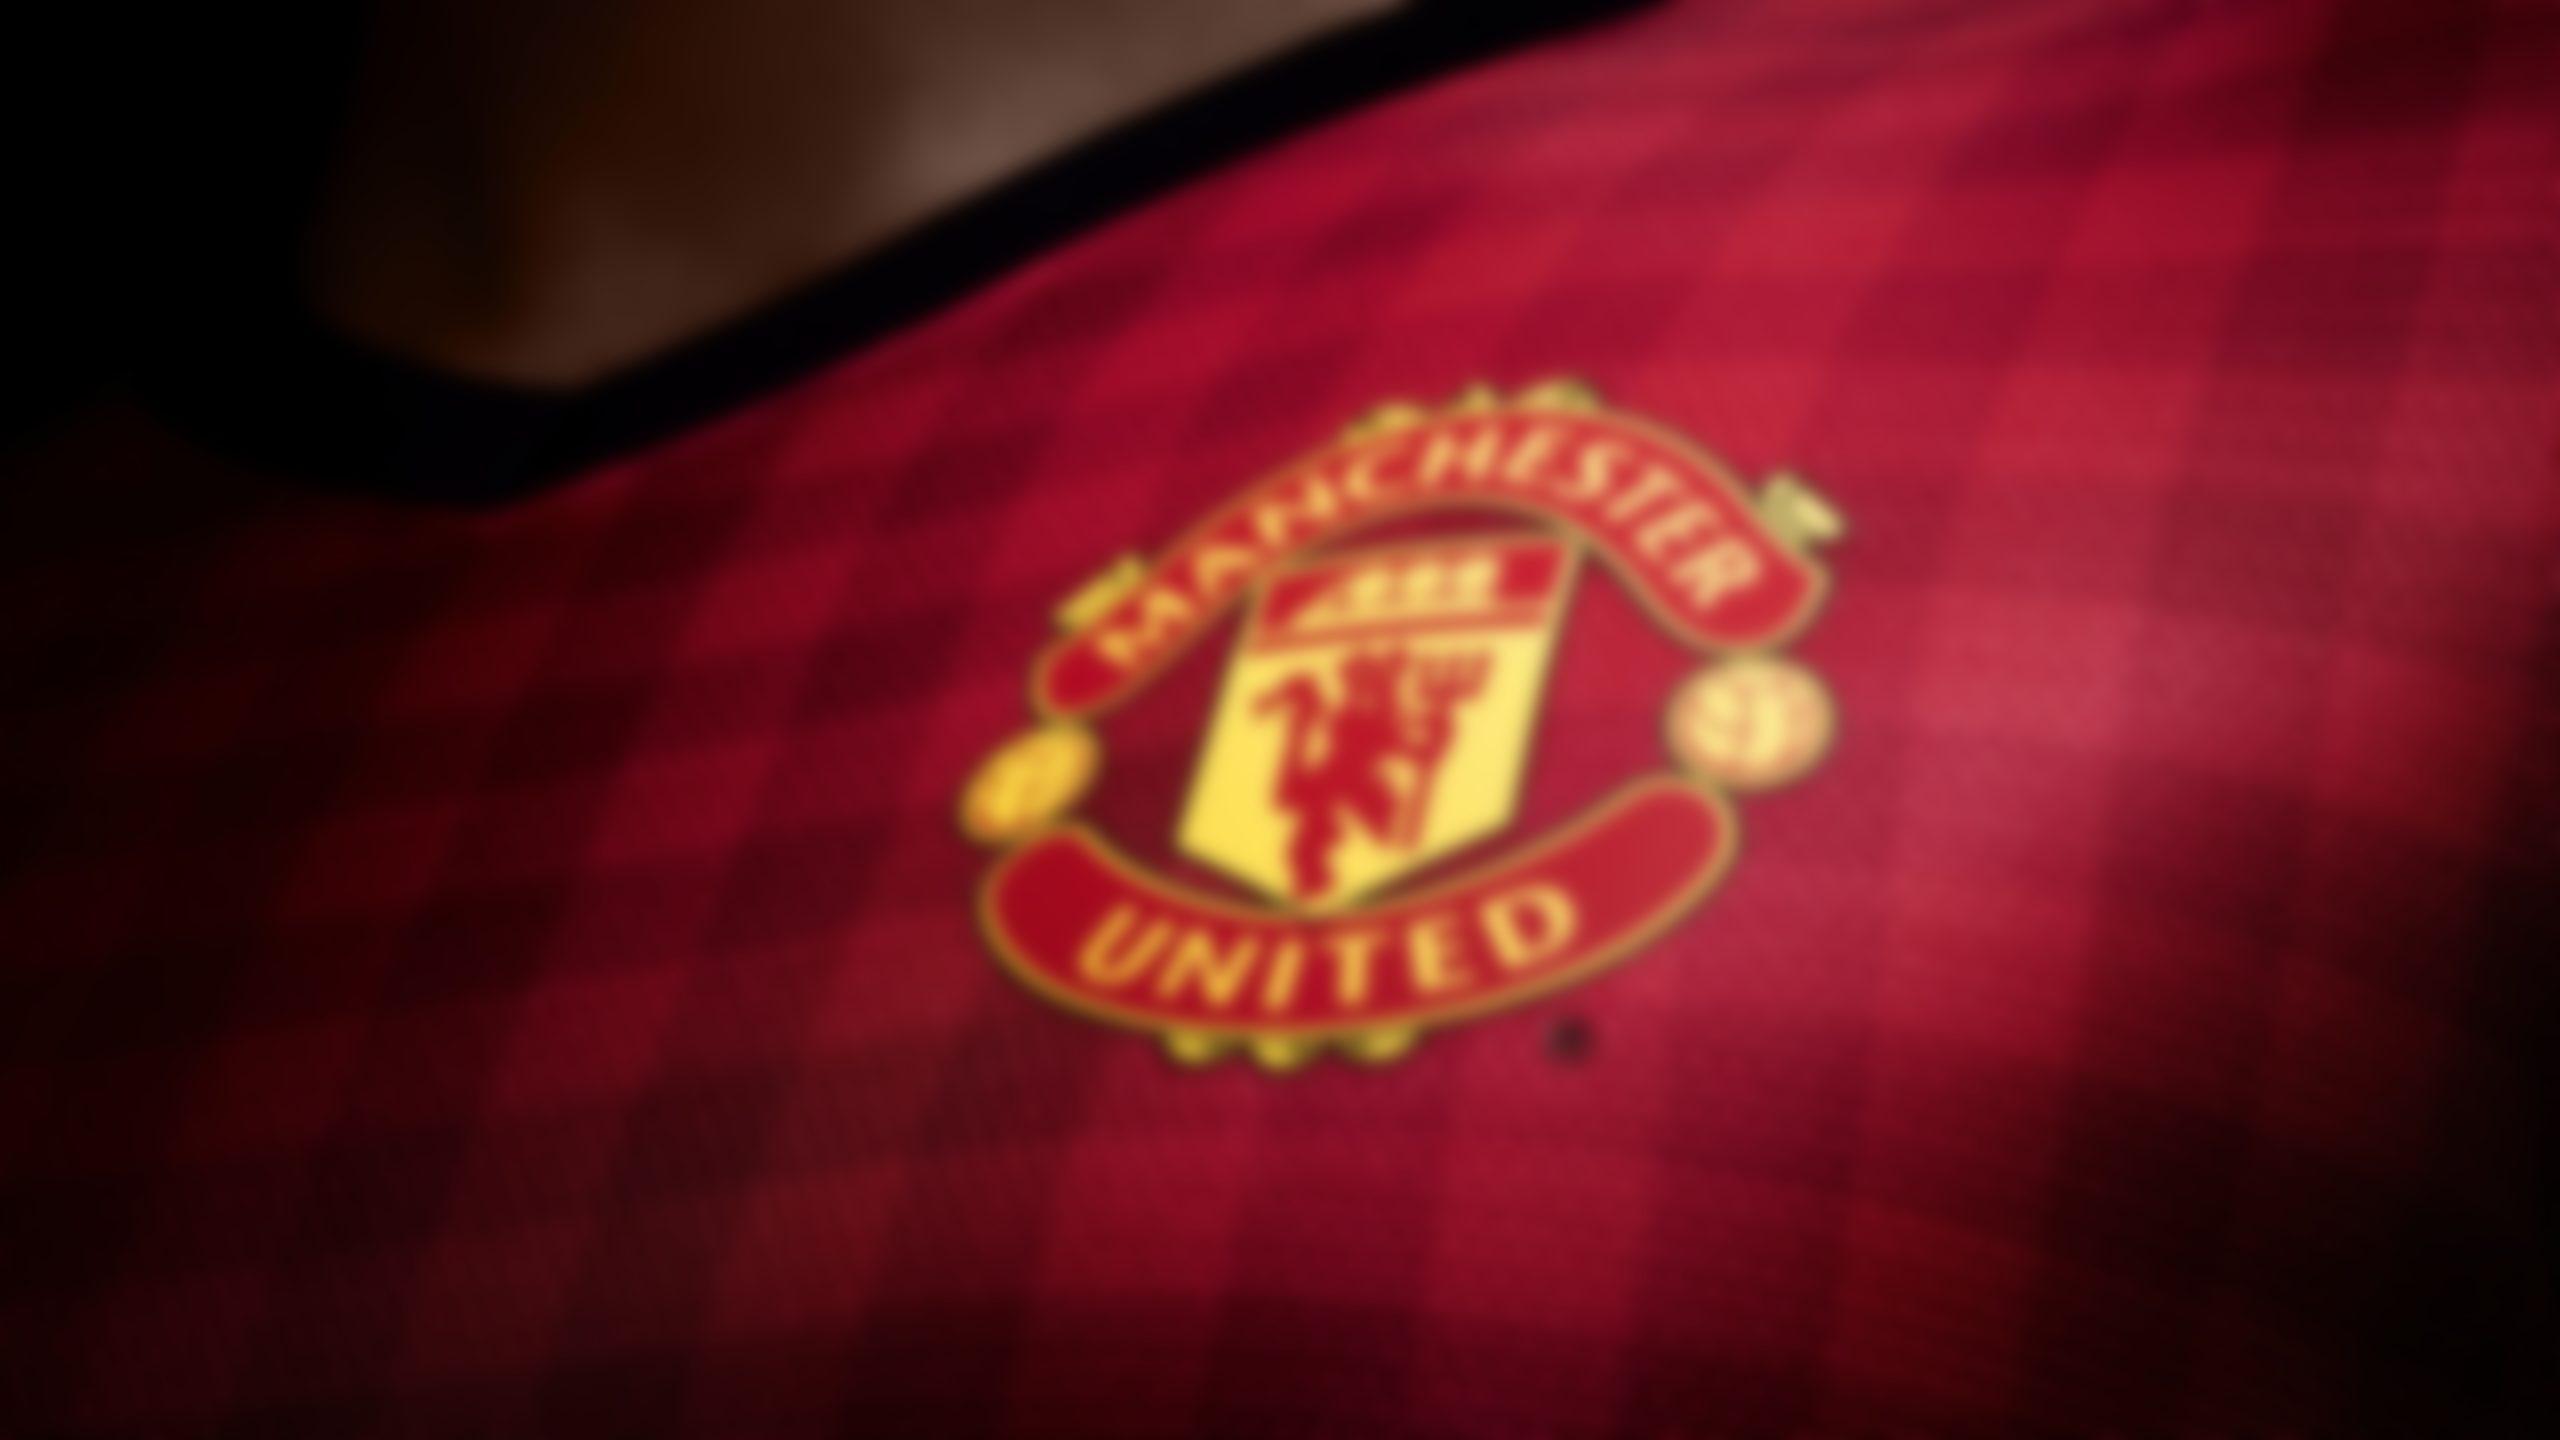 Manchester United shirt logo wallpaper 4k HD download for desktop